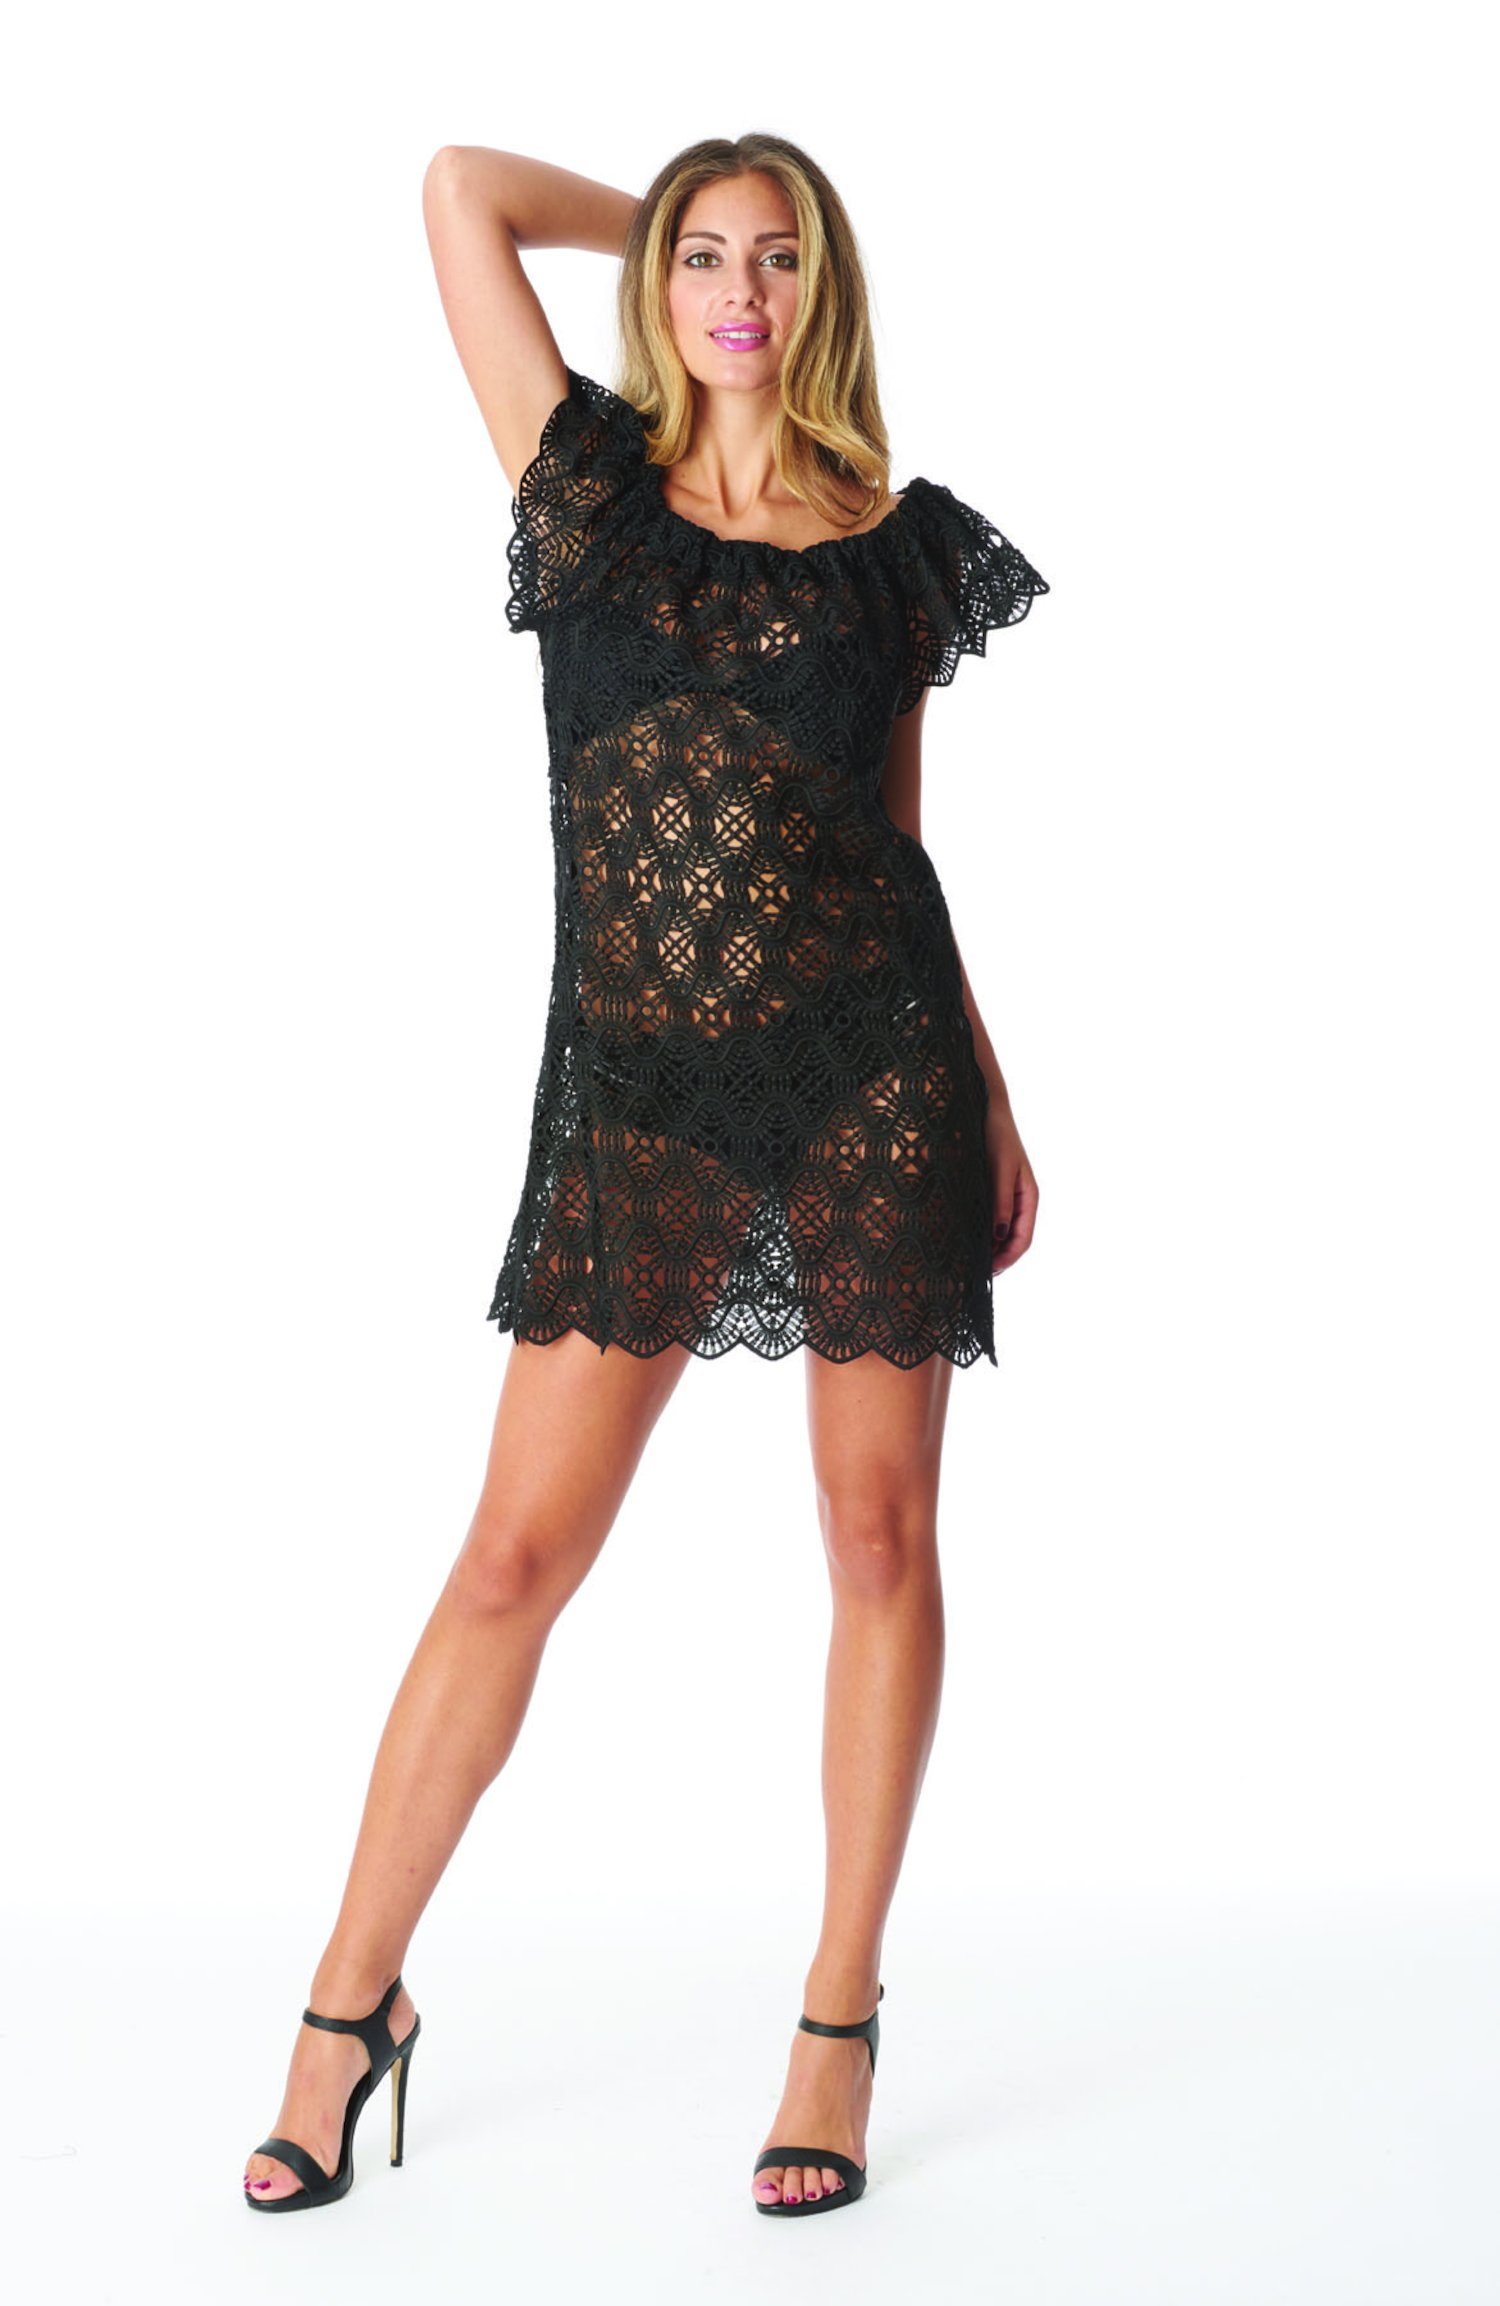 SHORT DRESS TRAPEZE - Pizzo Nero